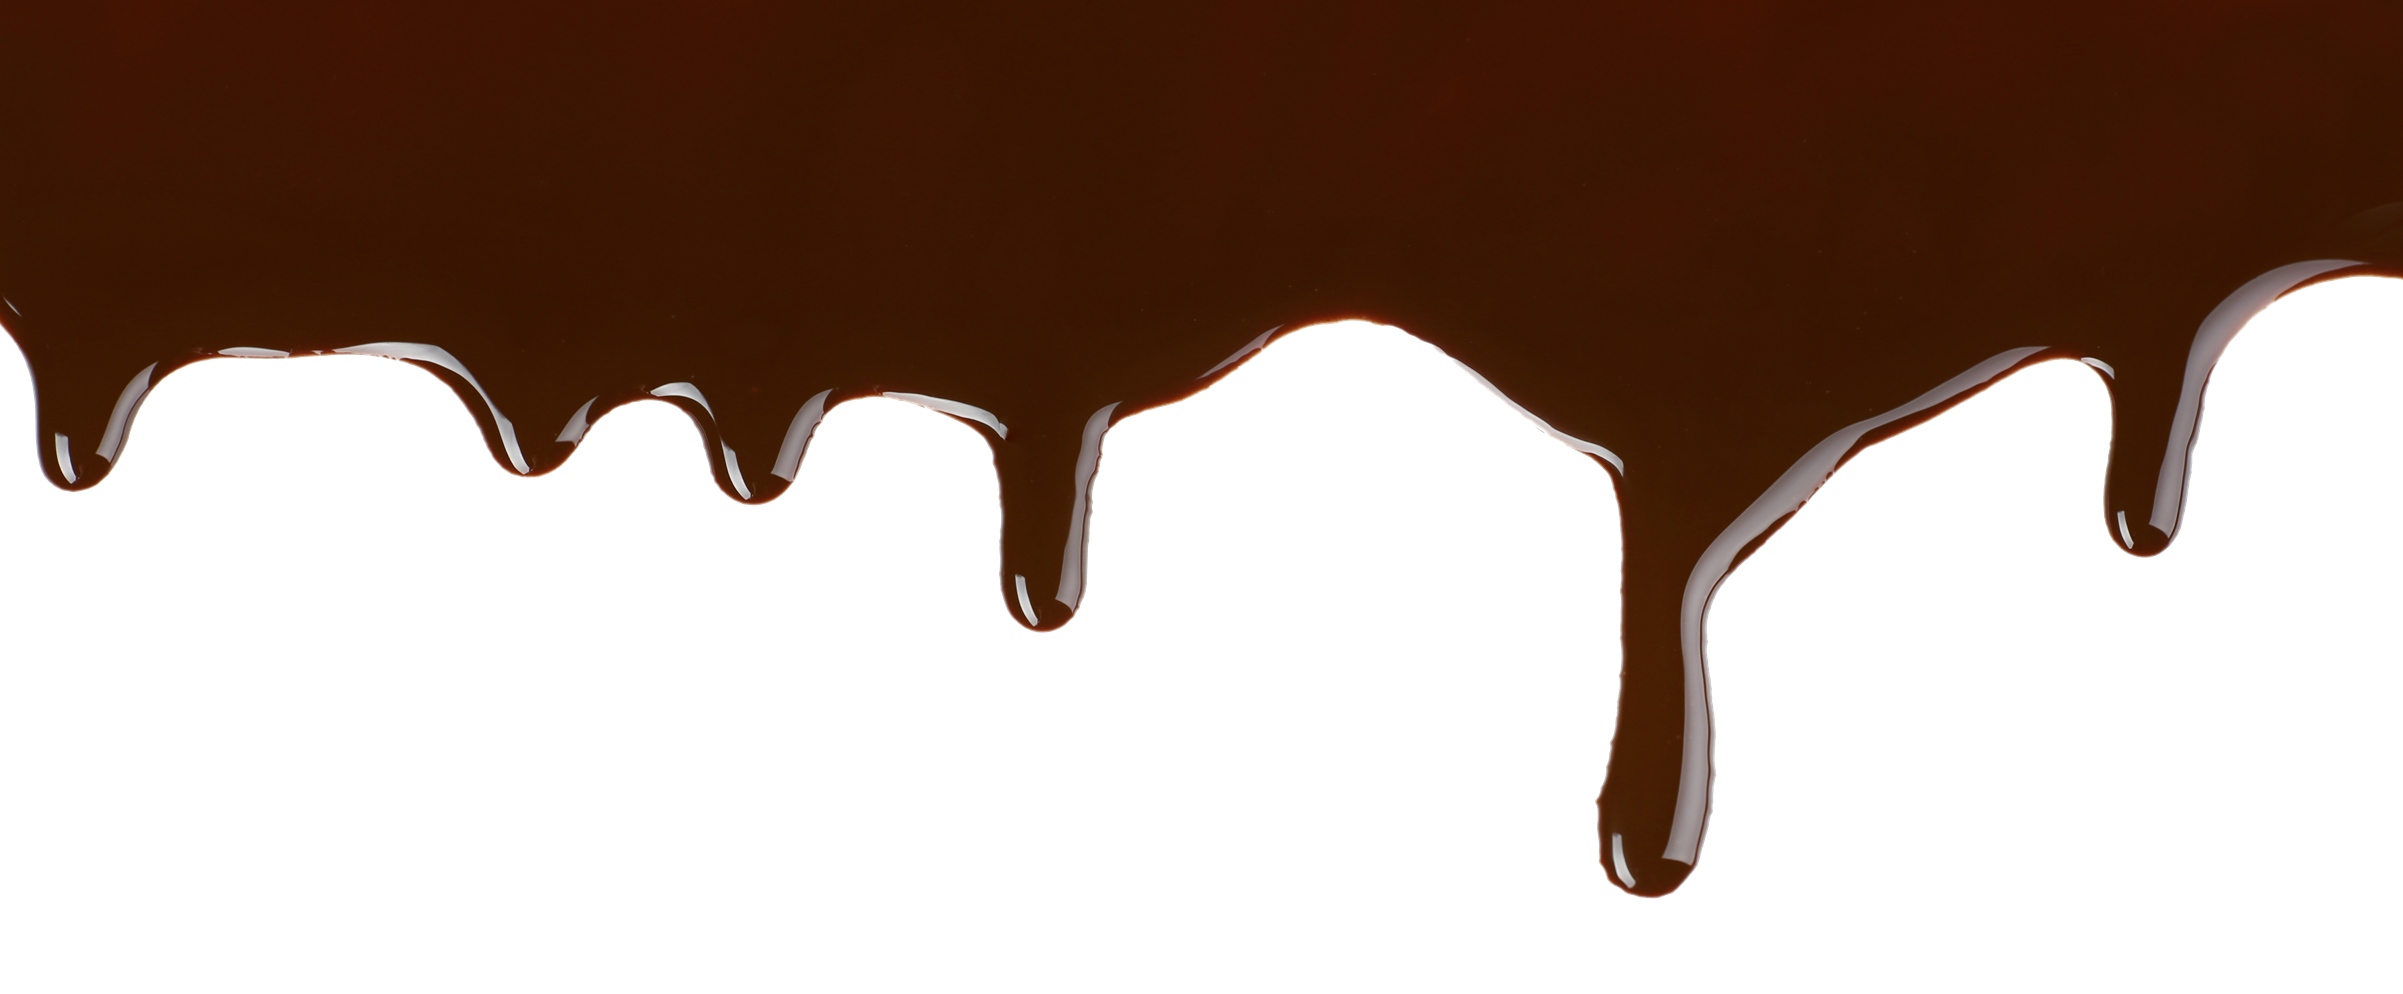 Melting Chocolate Bar PNG - 46331